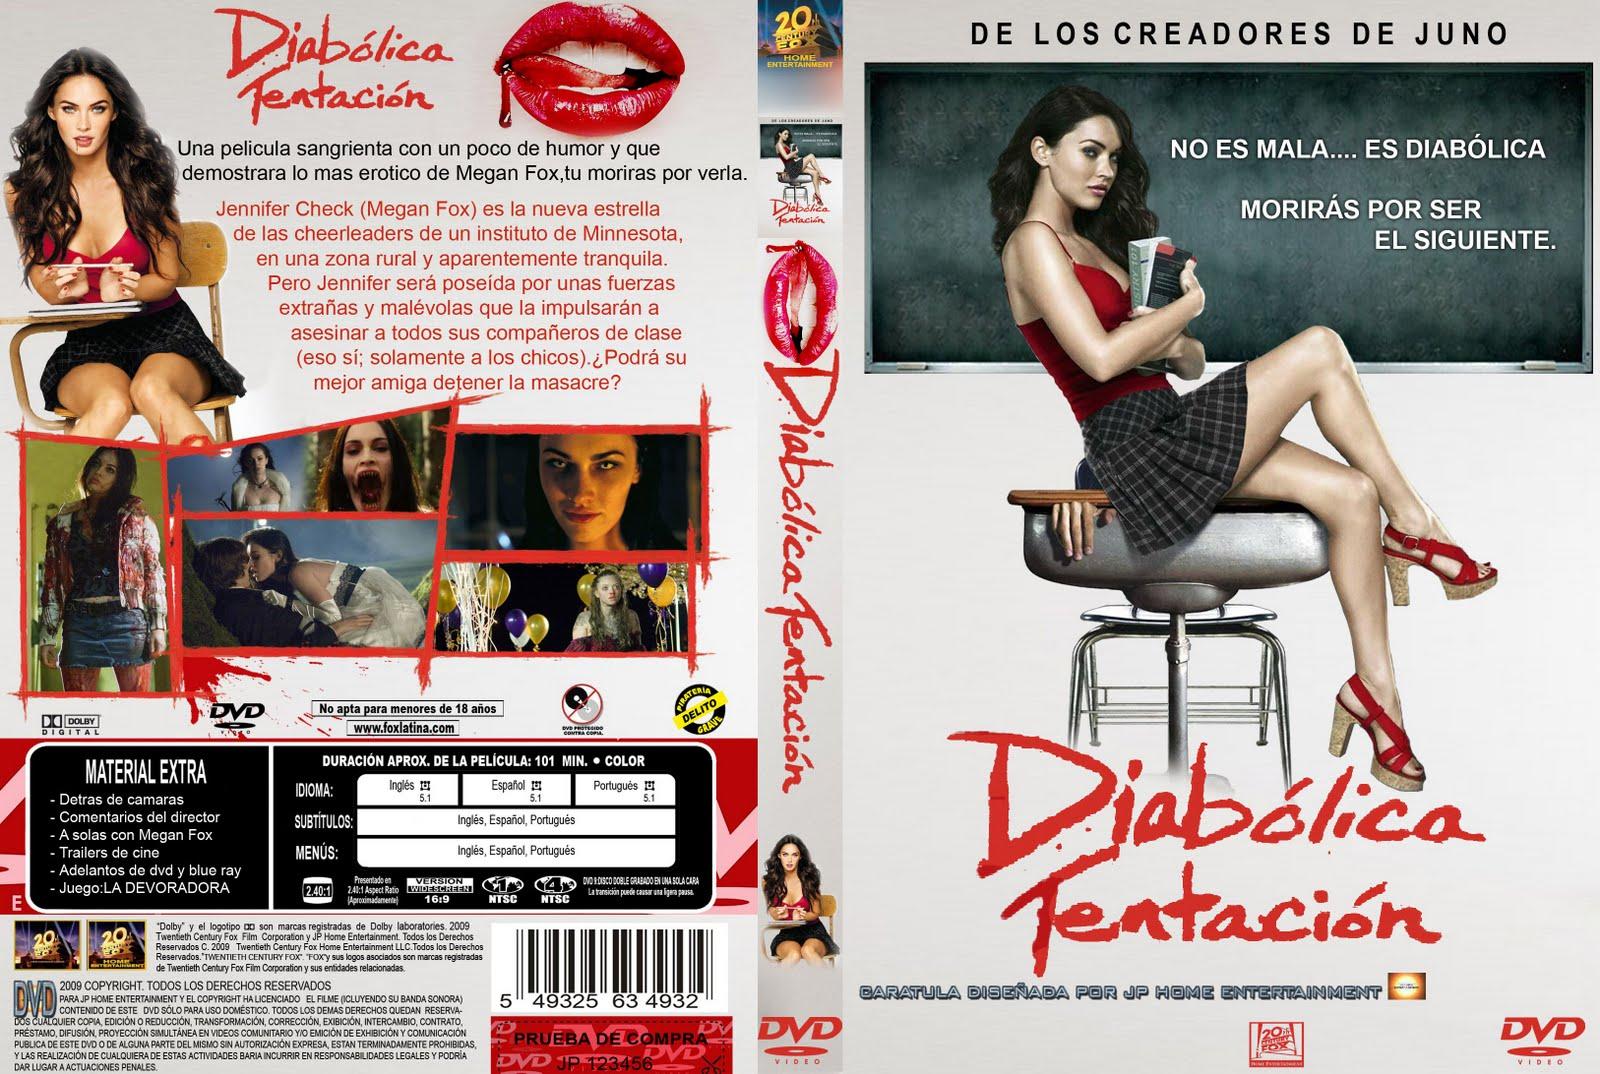 http://3.bp.blogspot.com/_R8FMZIDmtTY/SwHxJNl3OmI/AAAAAAAACOM/px2_rT5kO_o/s1600/Diabolica_Tentacion_-_Custom_por_misterestrenos_[dvd]_80.jpg